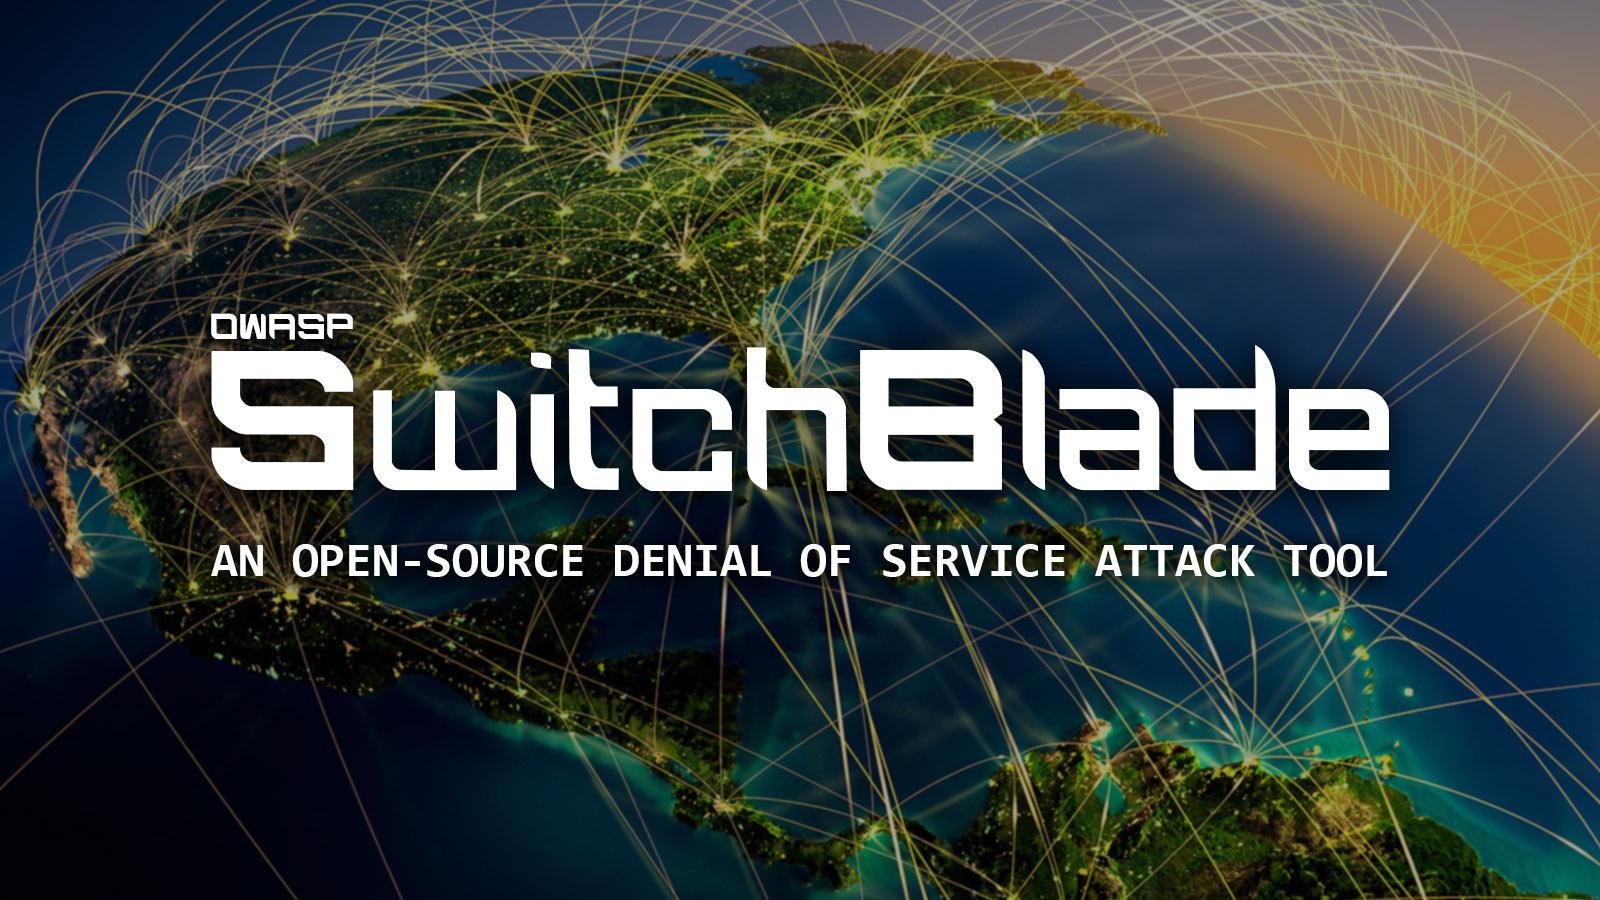 OWASP SwitchBlade DoS Tool